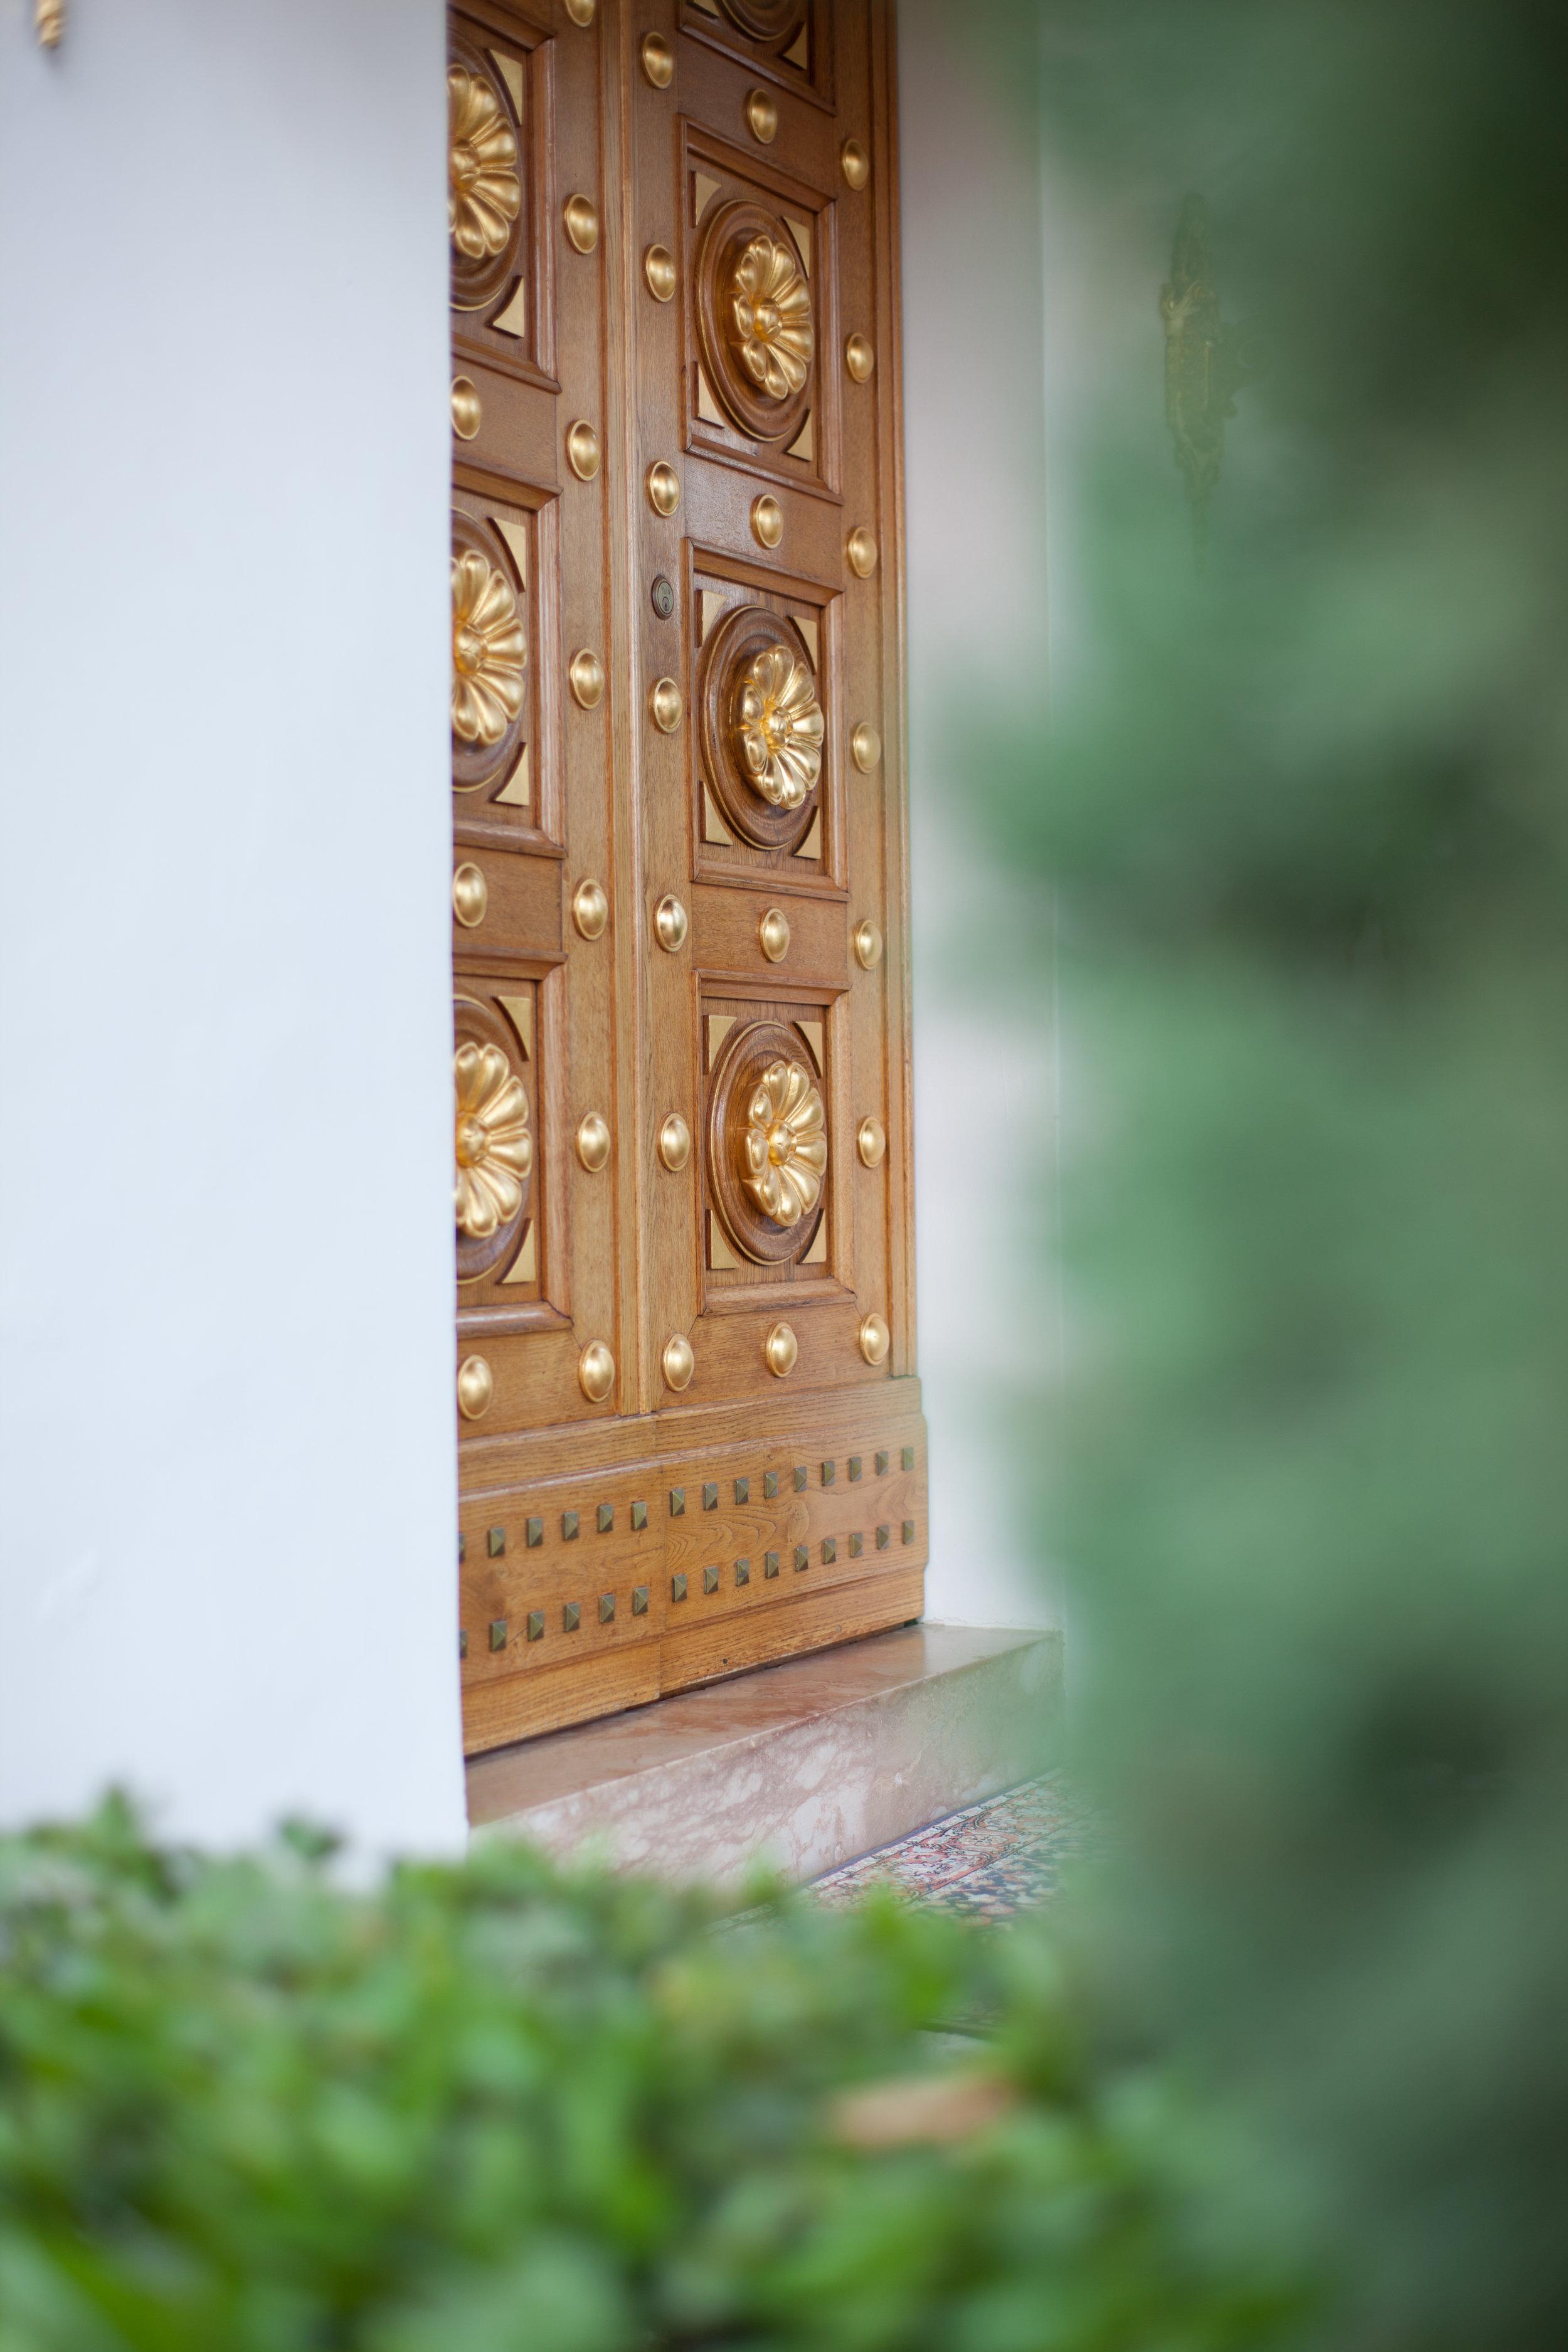 Door of the Shrine of Bahá'u'lláh